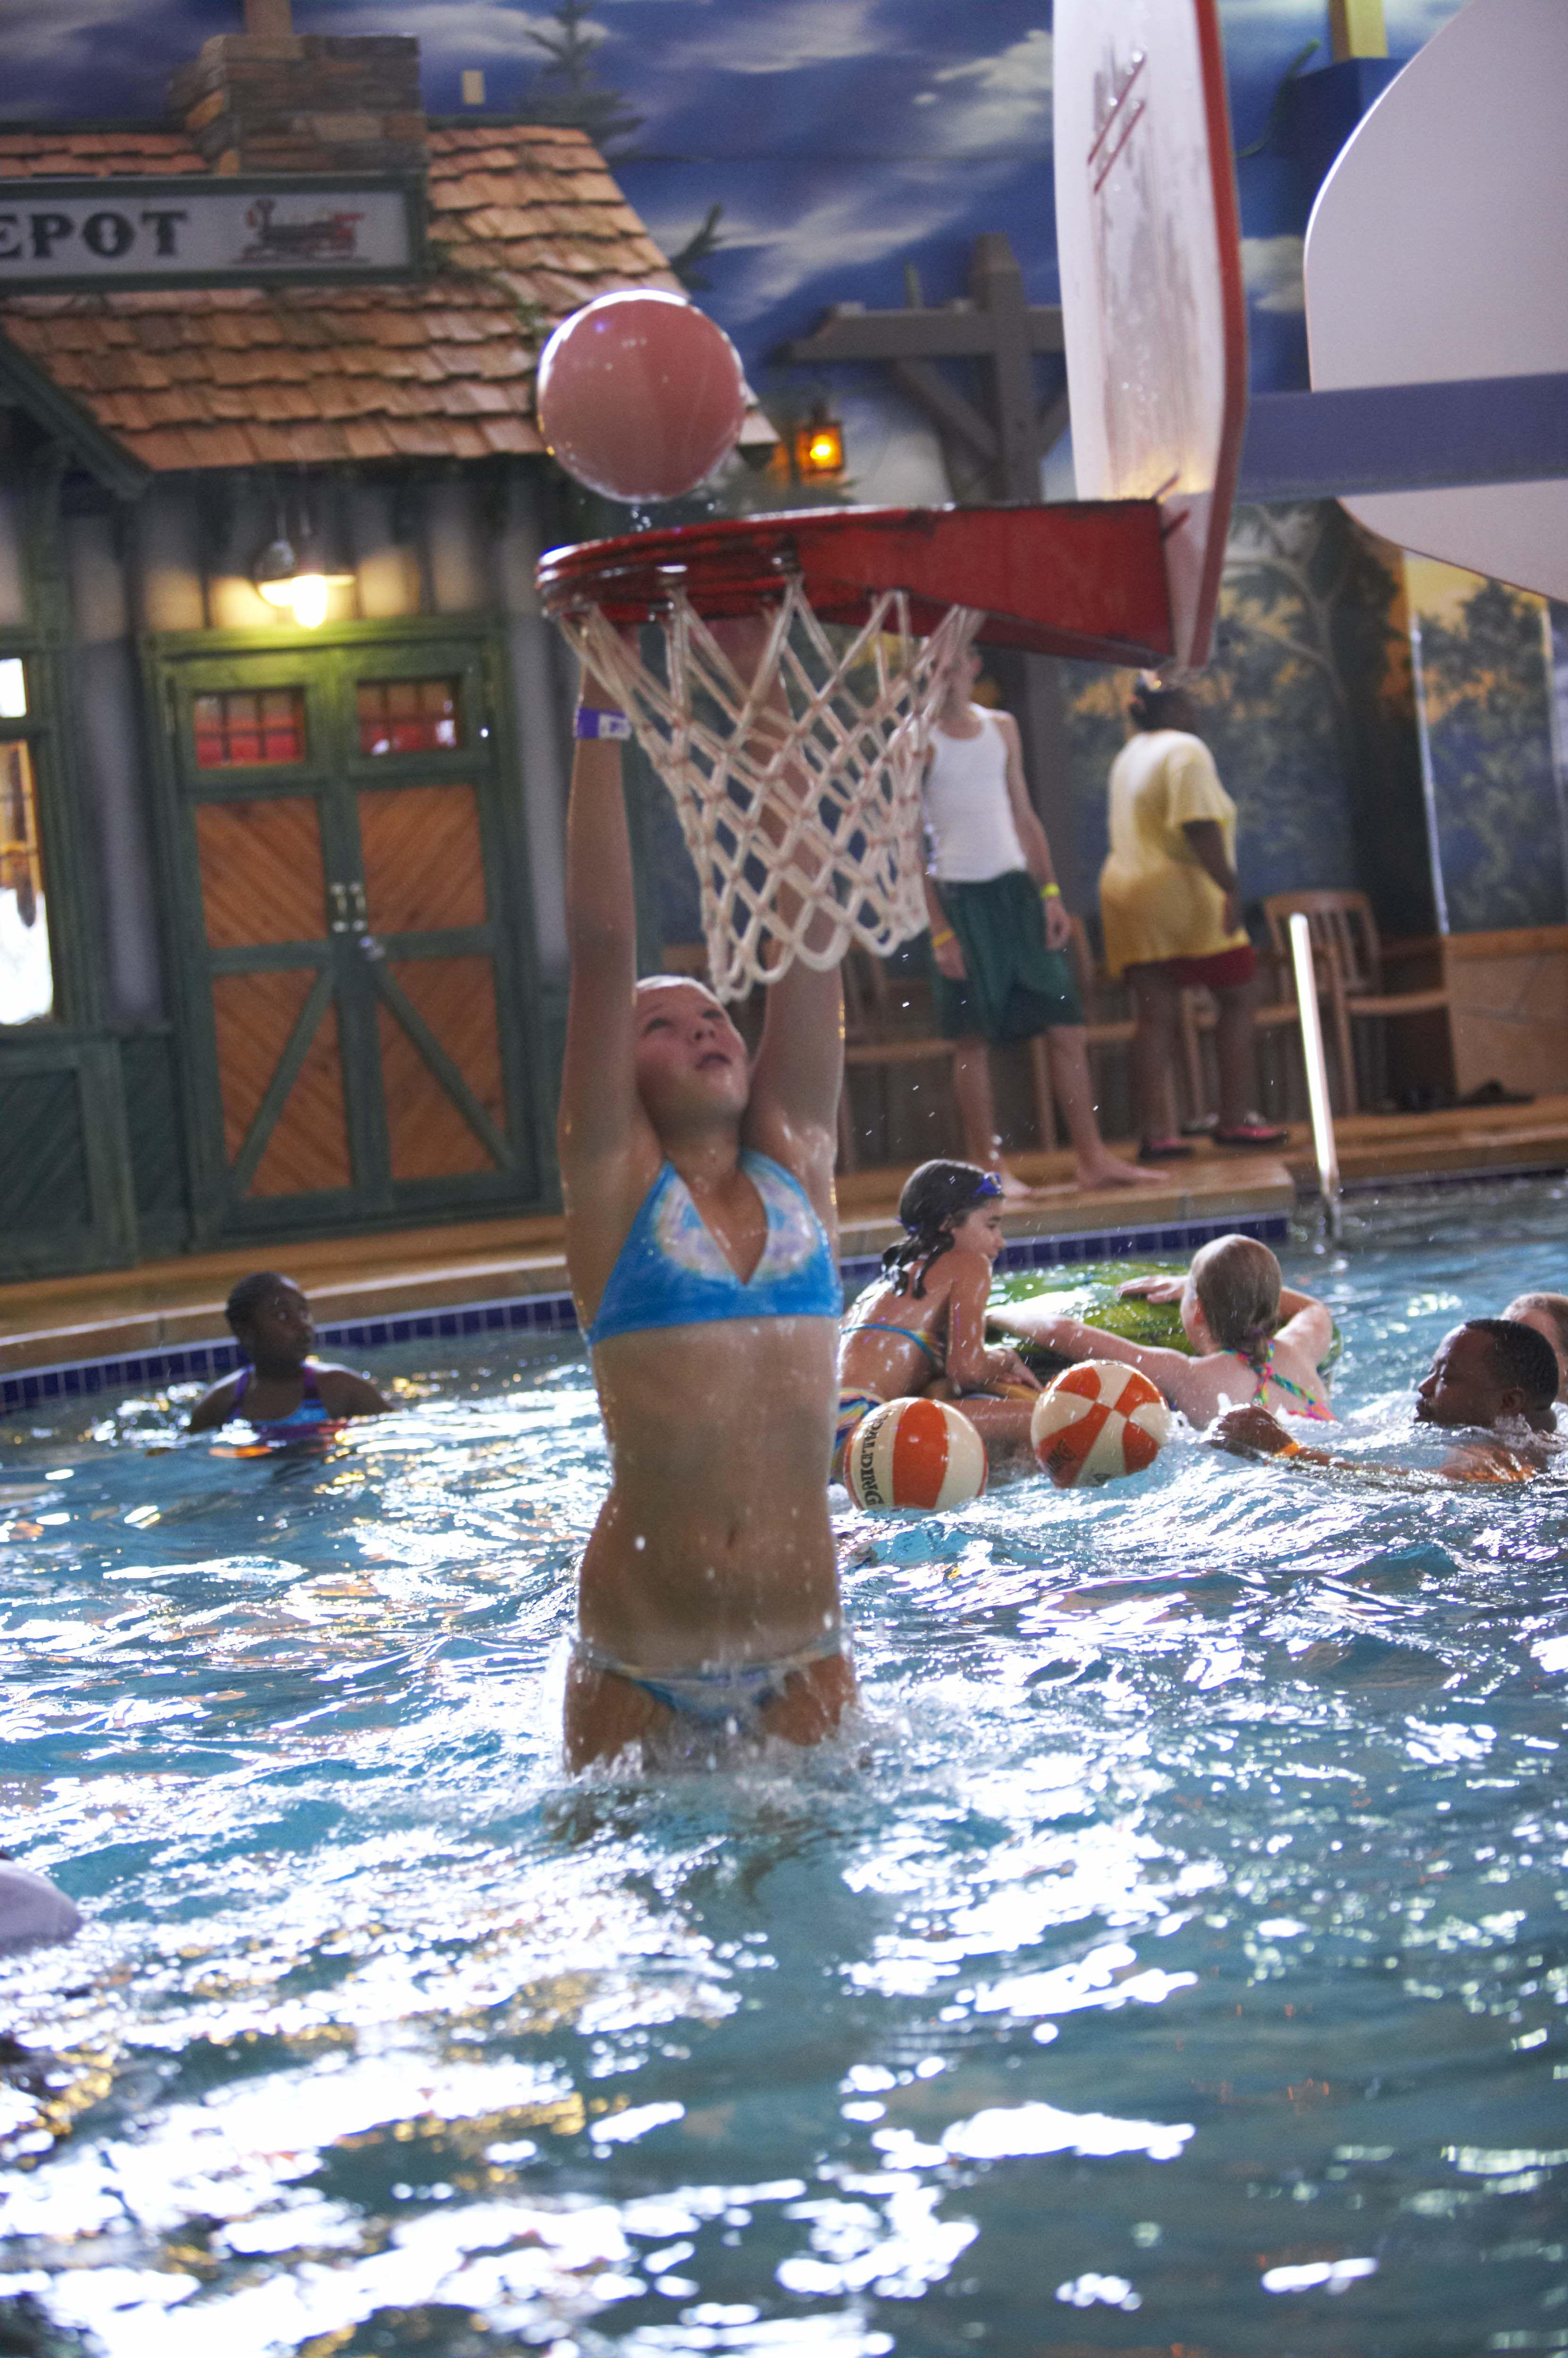 Country Springs Hotel Water Park Indoor Waterpark Hot Tub Outdoor